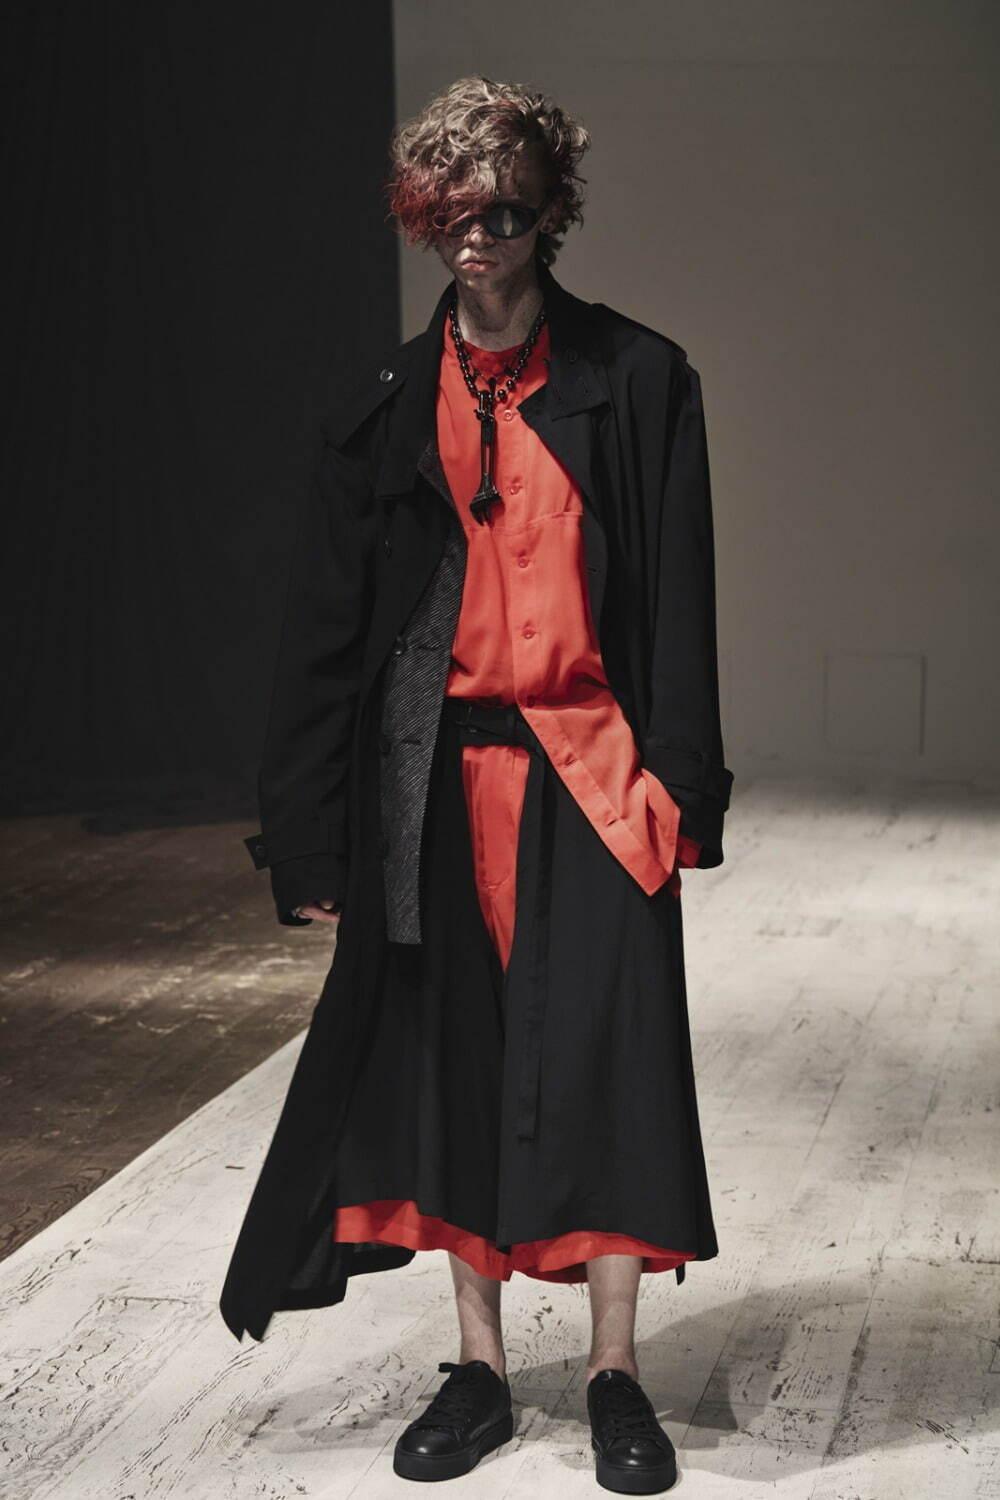 https://www.fashion-press.net/img/news/74801/f7s.jpg